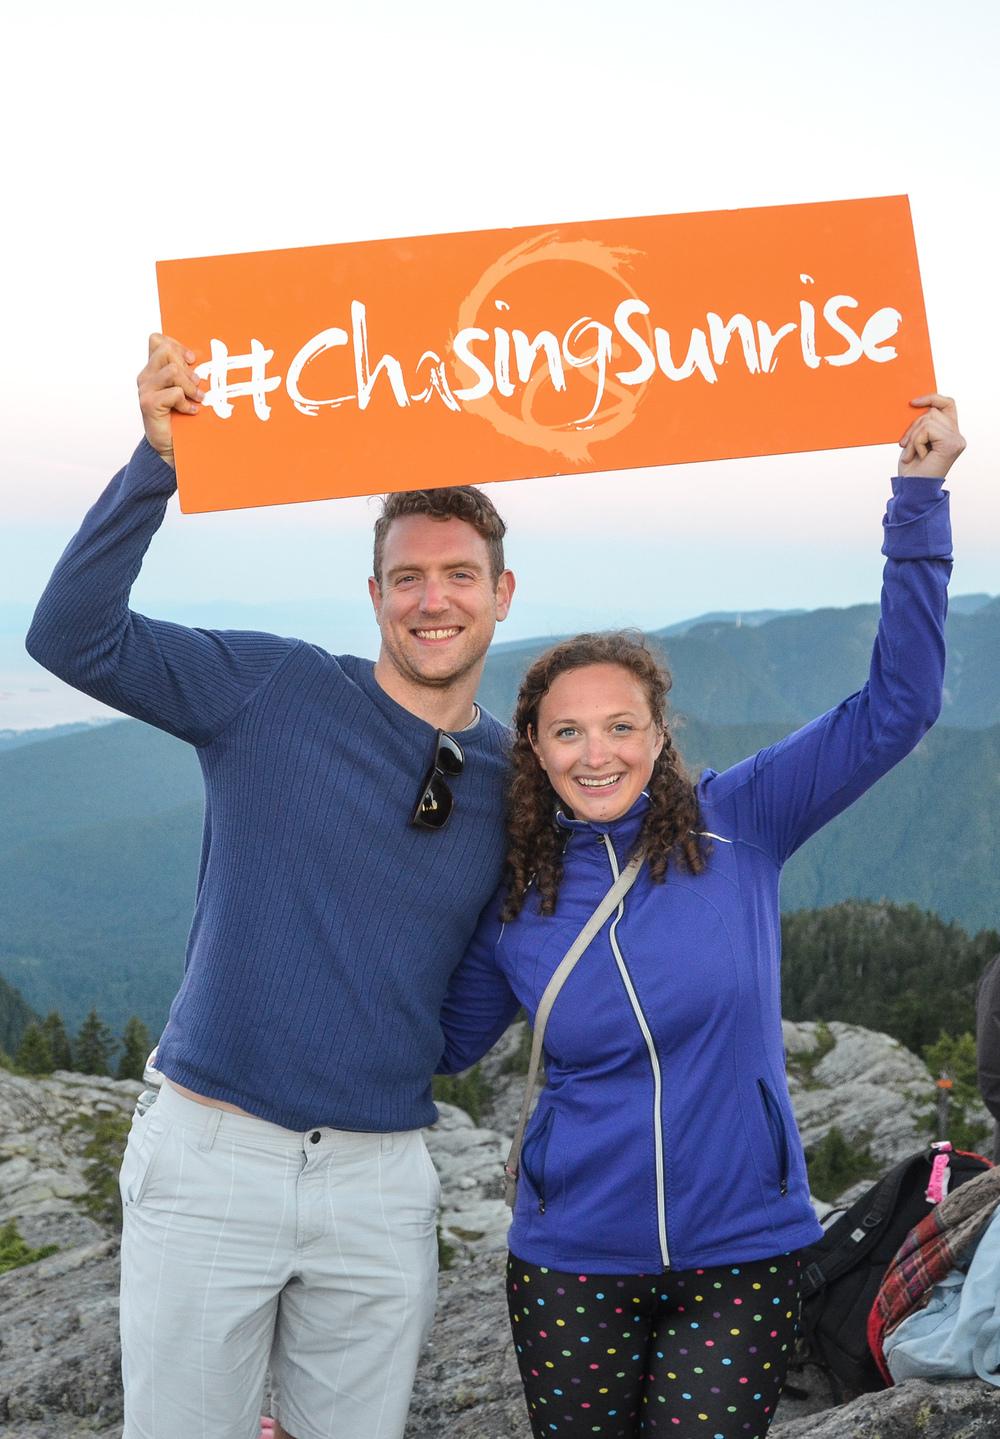 20150621 - Summer Solstice Chasing Sunrise-11.jpg